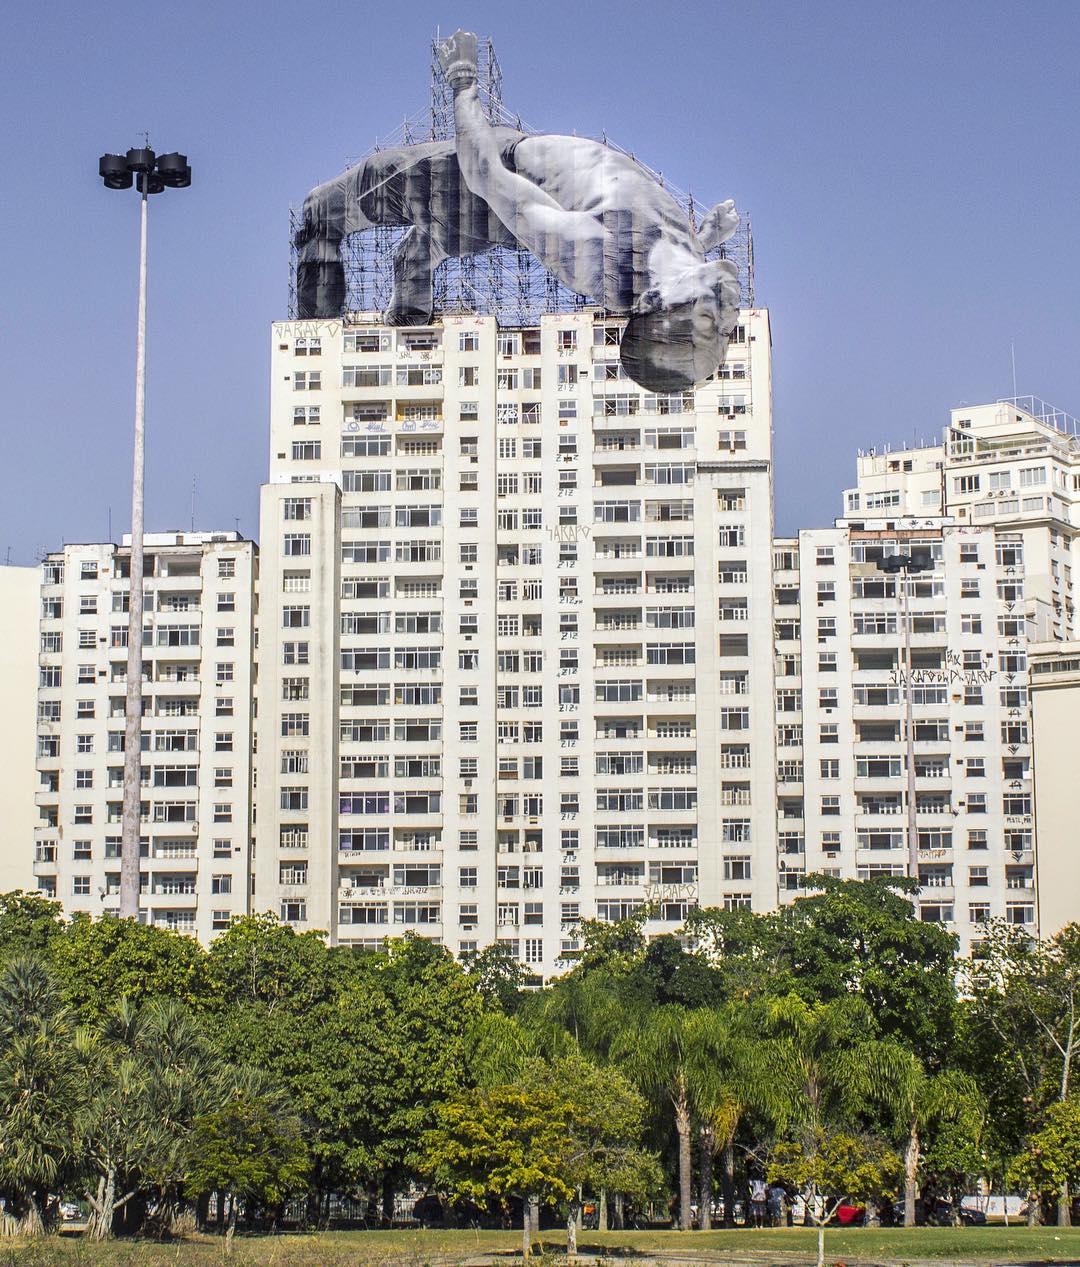 JR's giant athletes in Rio De Janeiro - the vandallist (2)